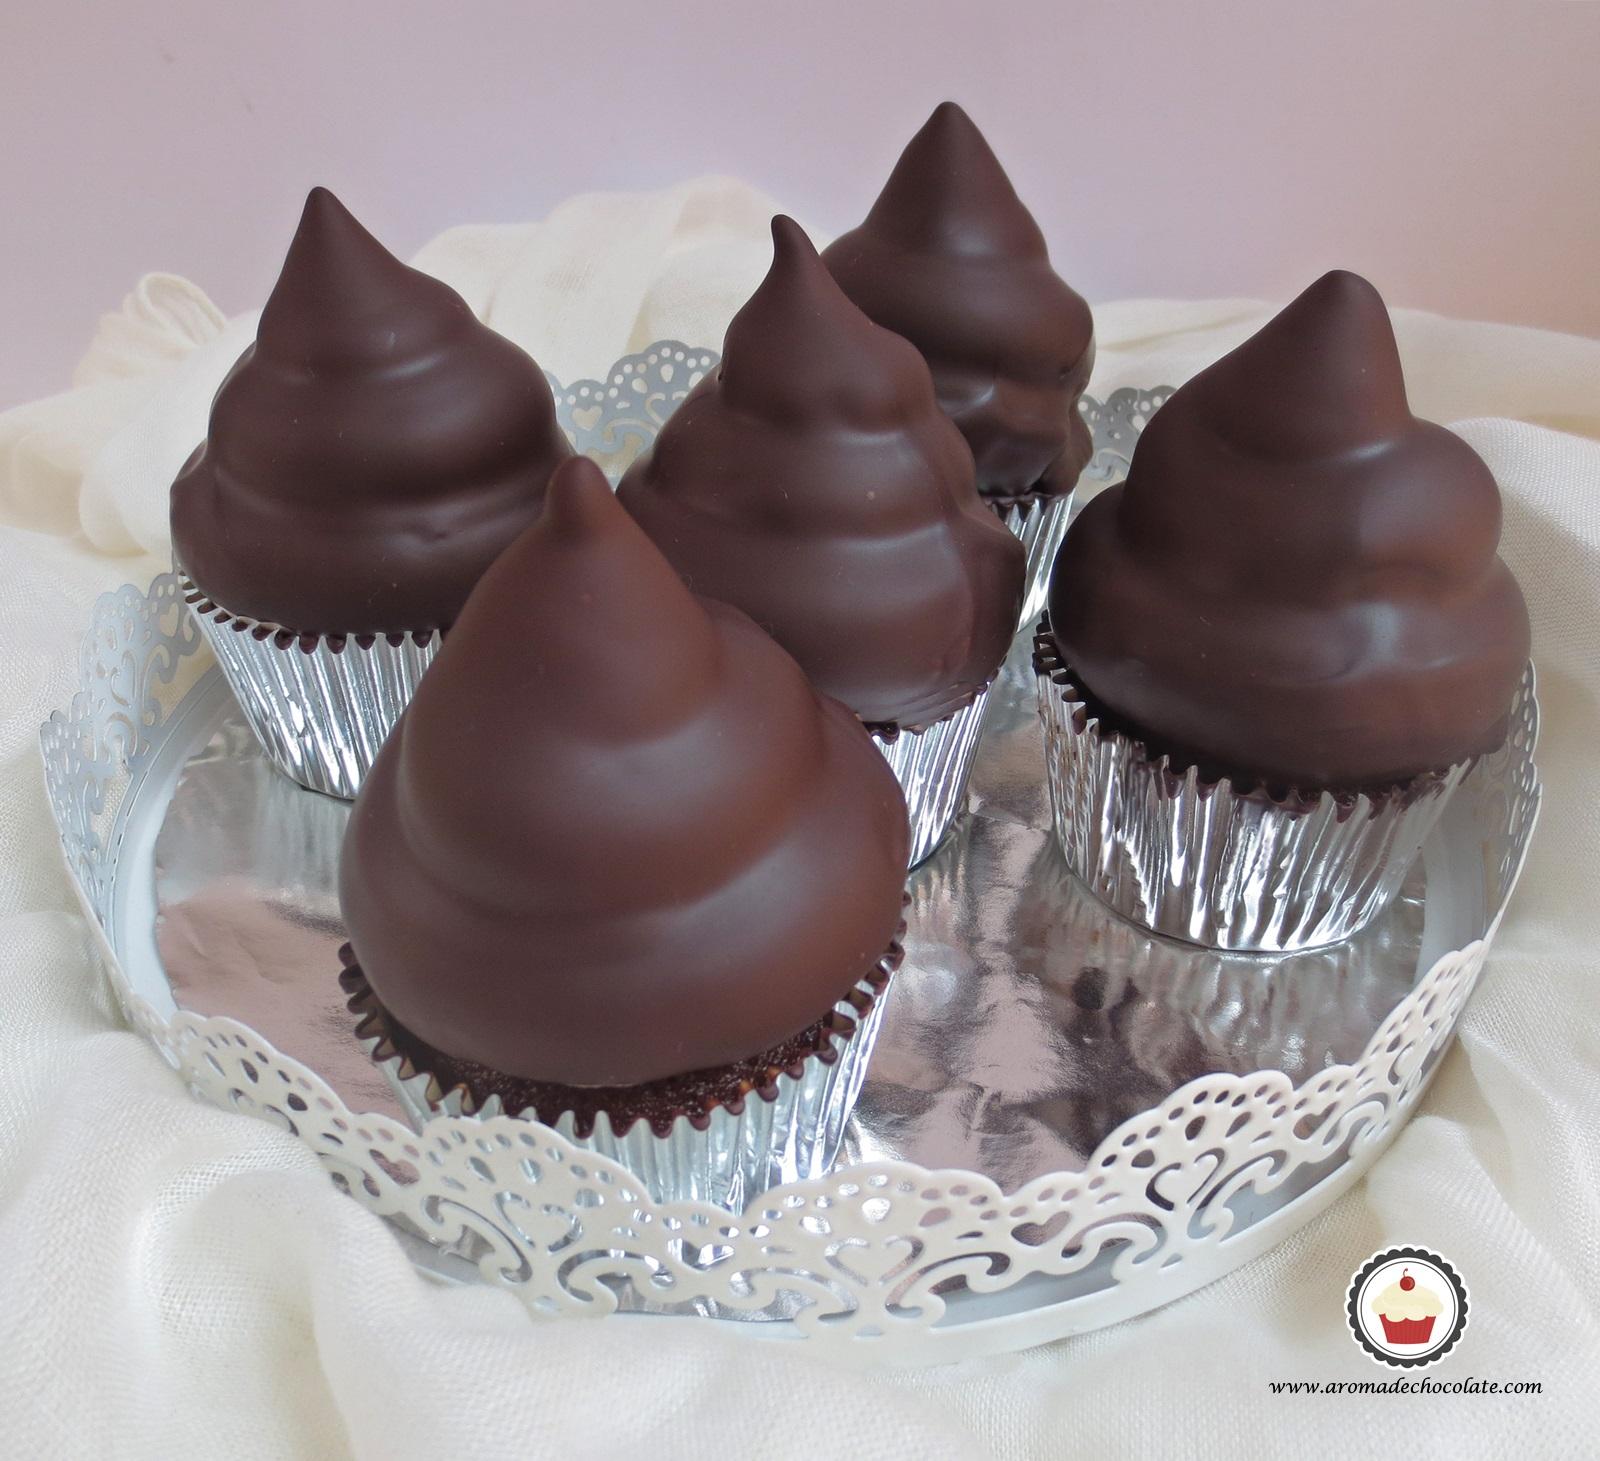 Bandeja Hi Hat Cupcakes. Aroma de chocolate